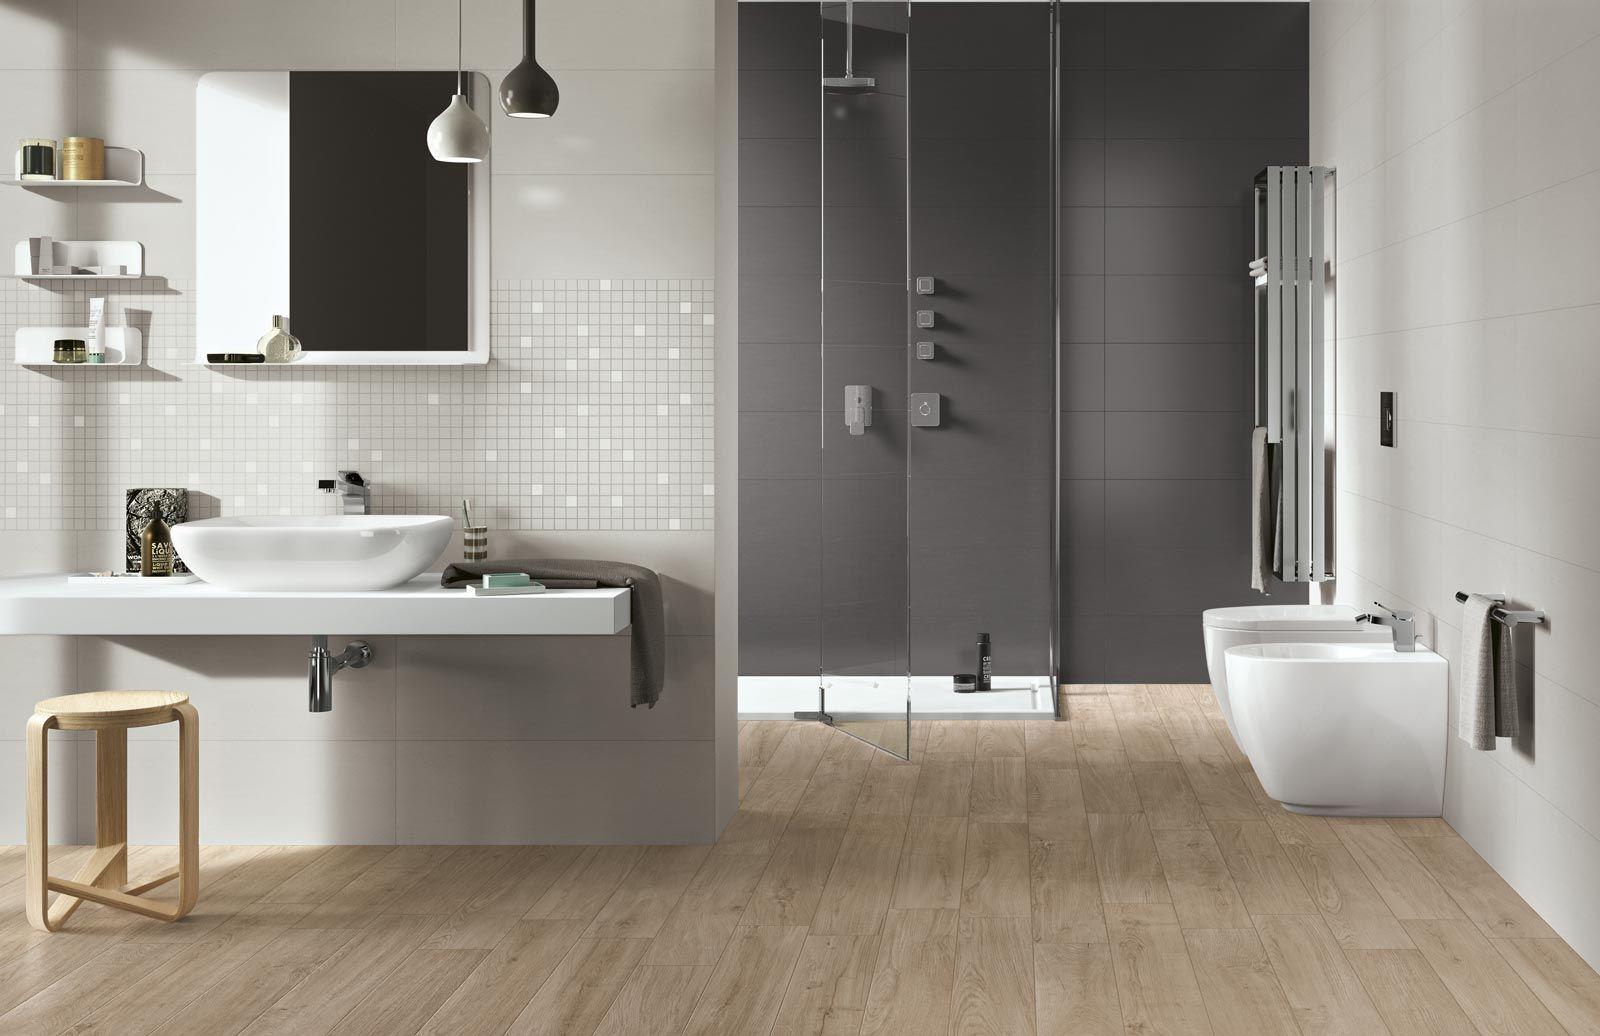 Woodpassion wood look stoneware floor tiles bathroom design